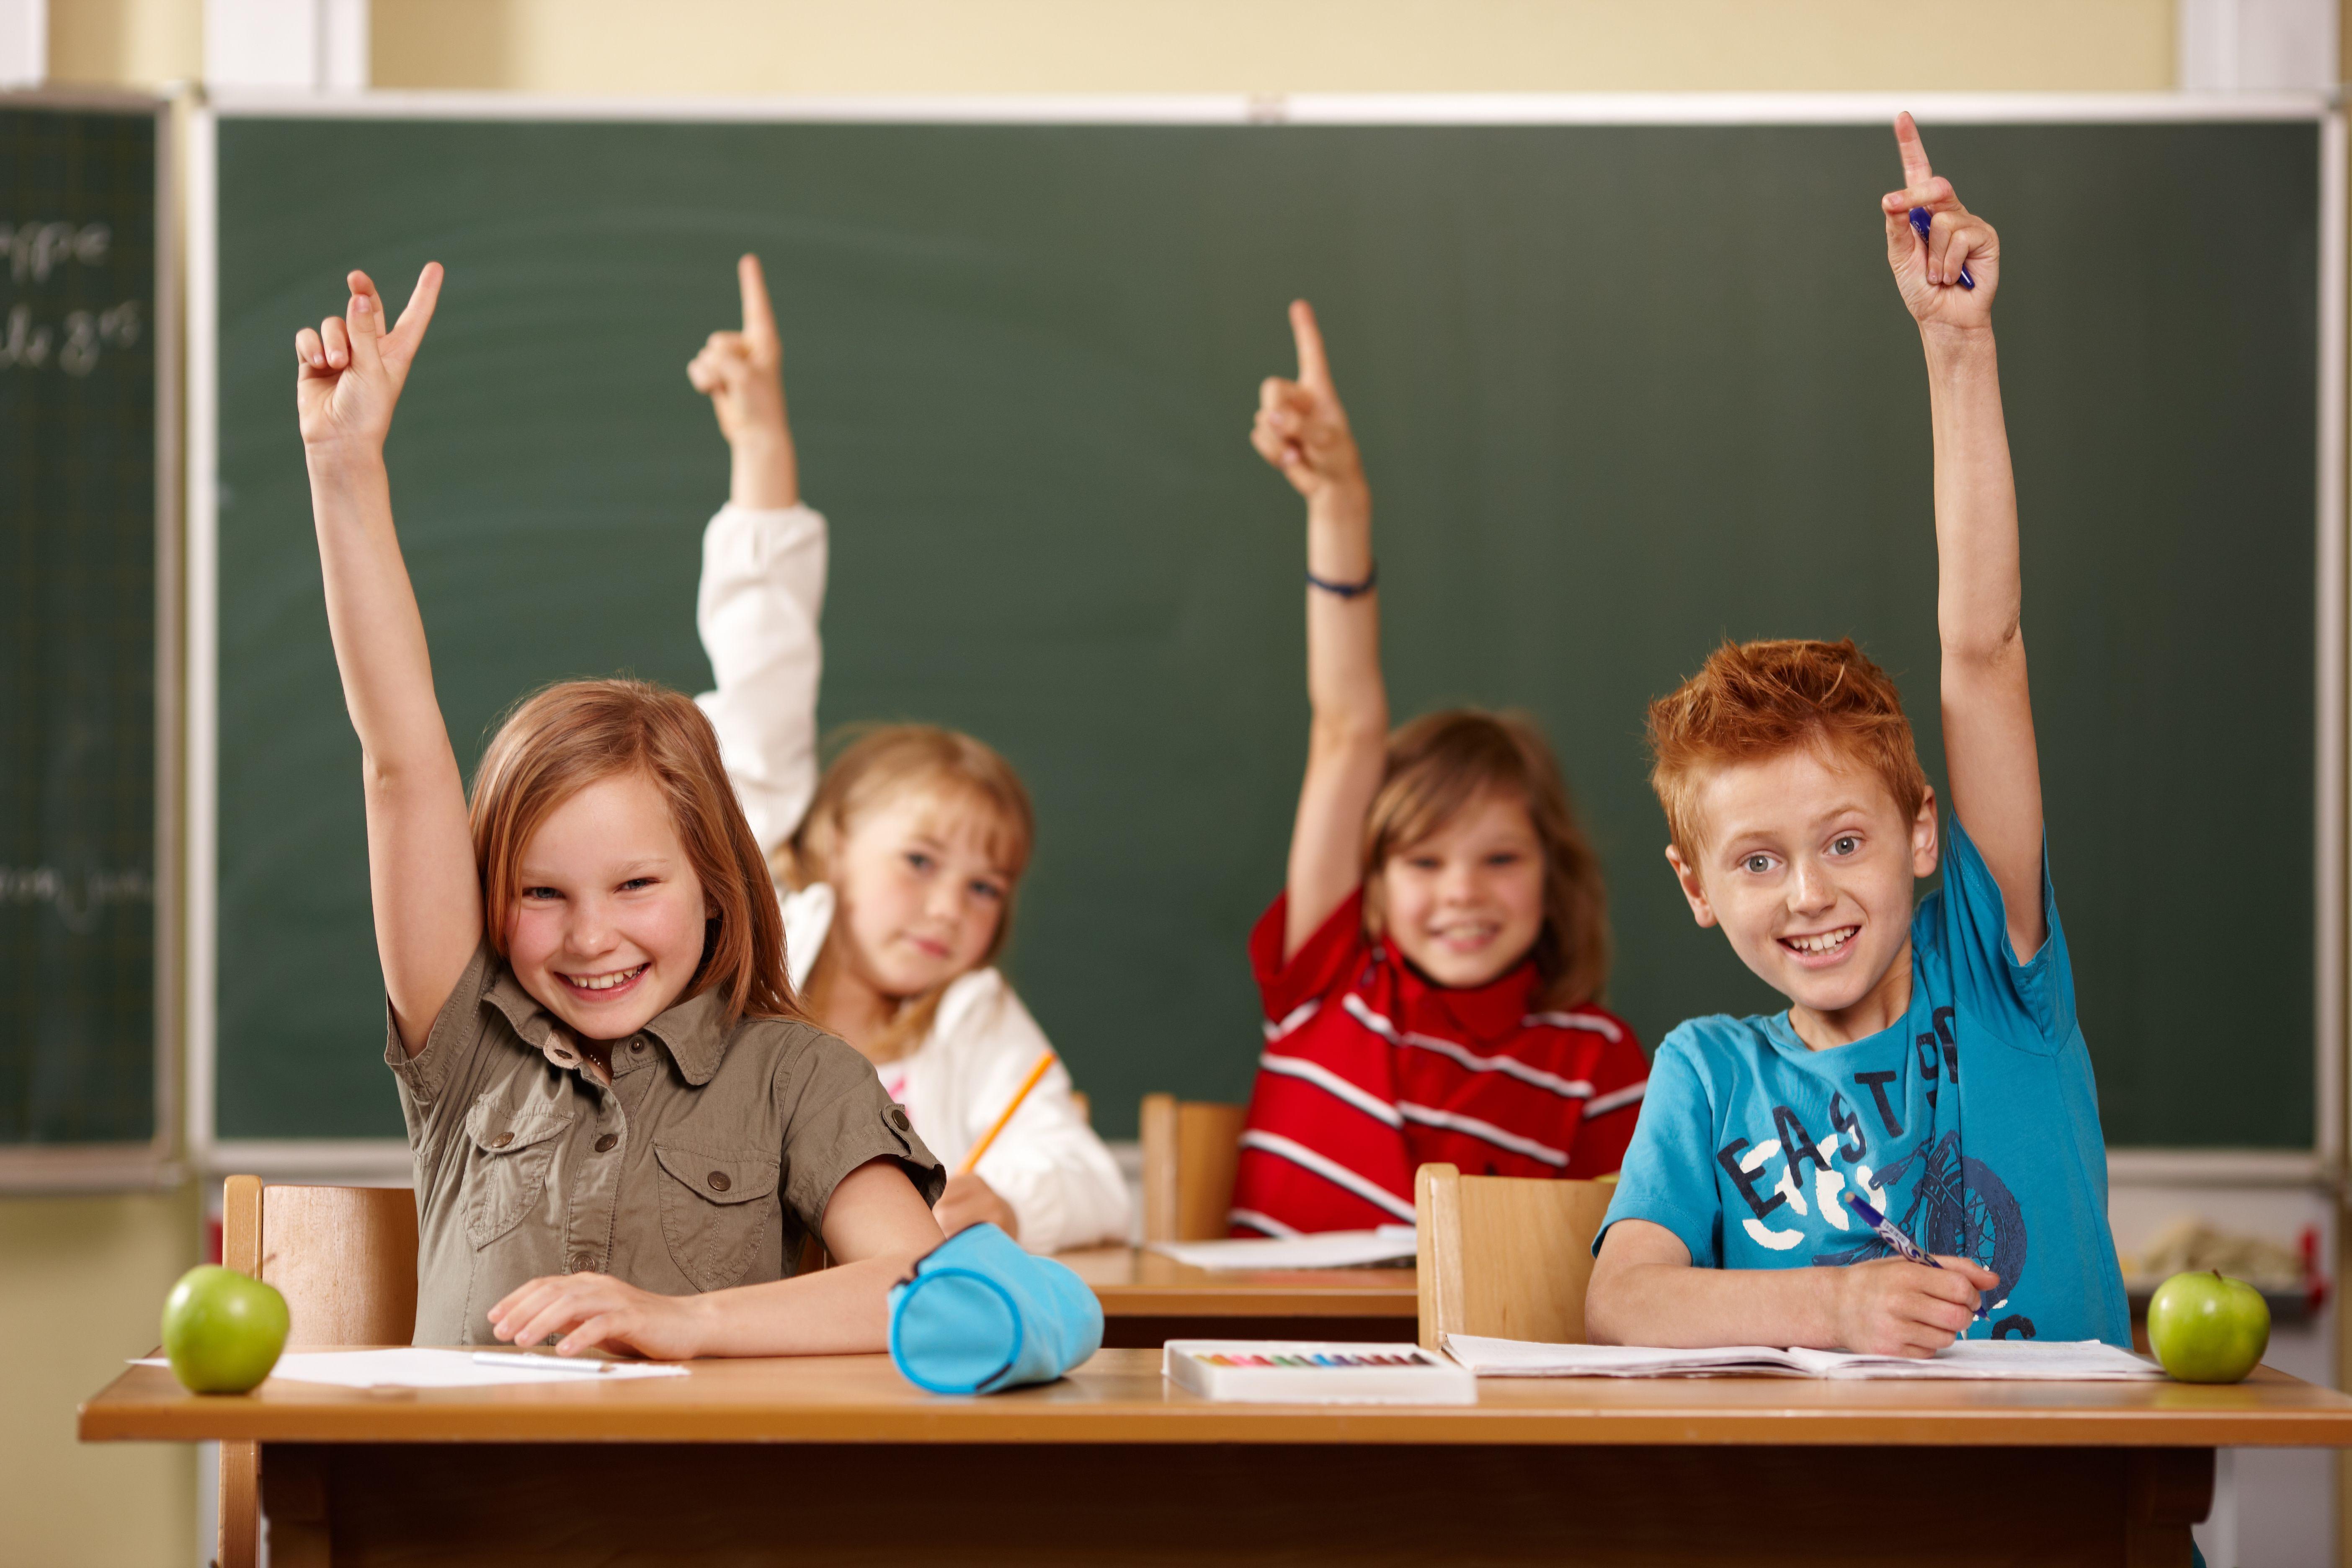 school children photos google search - School Pictures For Kids